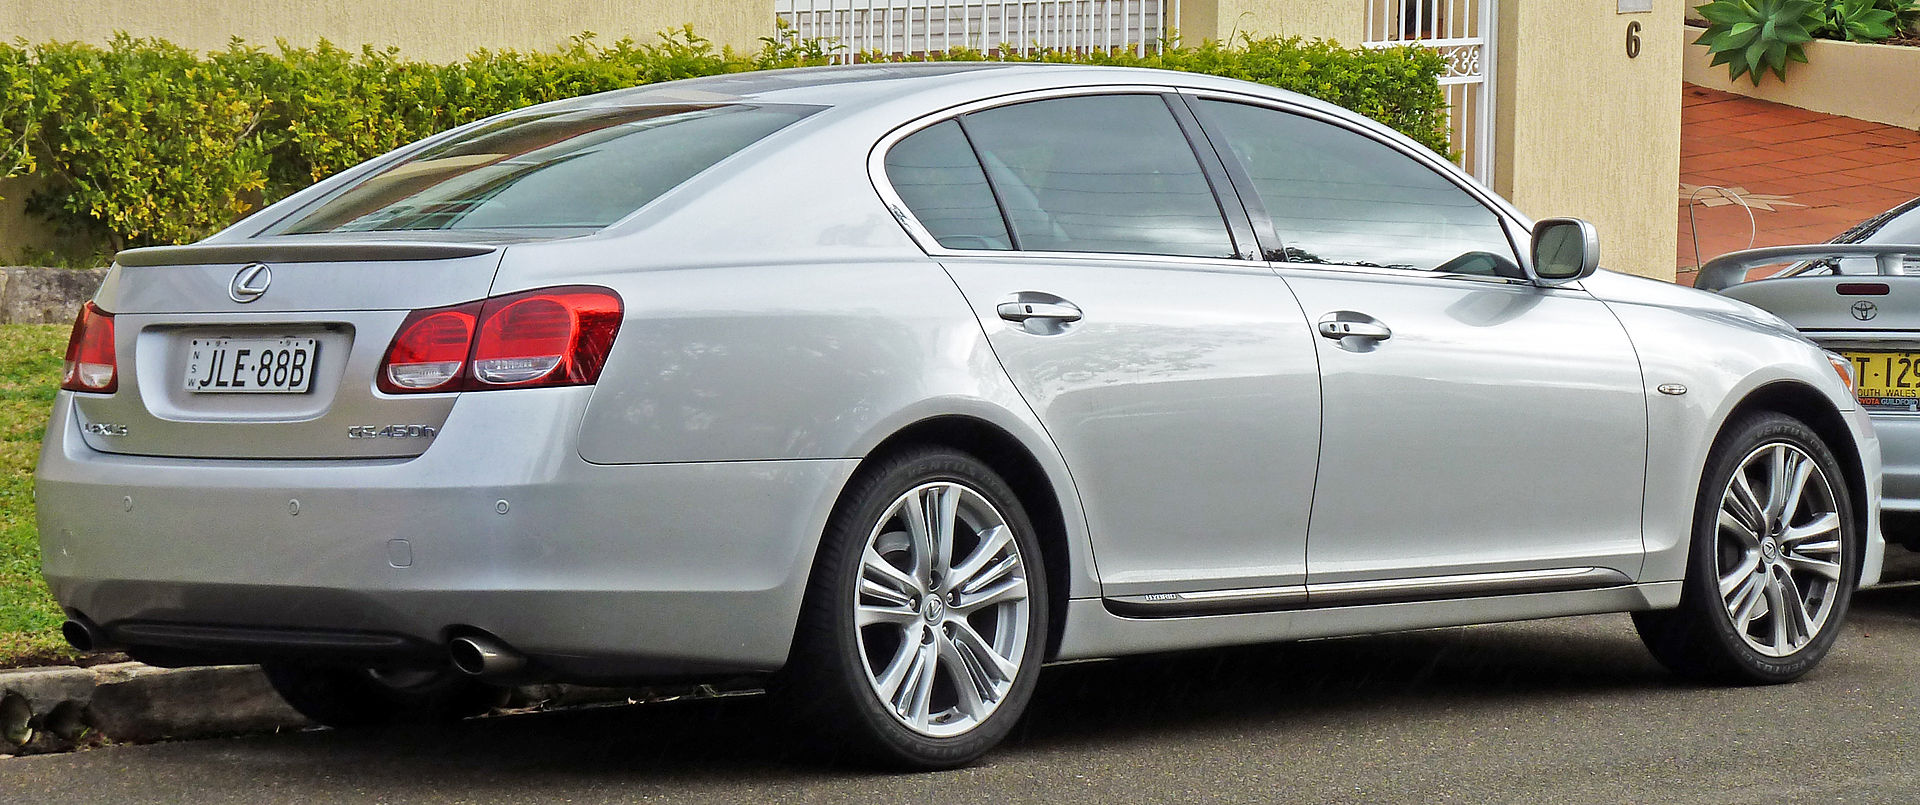 2006-2009_lexus_gs_450h_gws191r_sedan_02